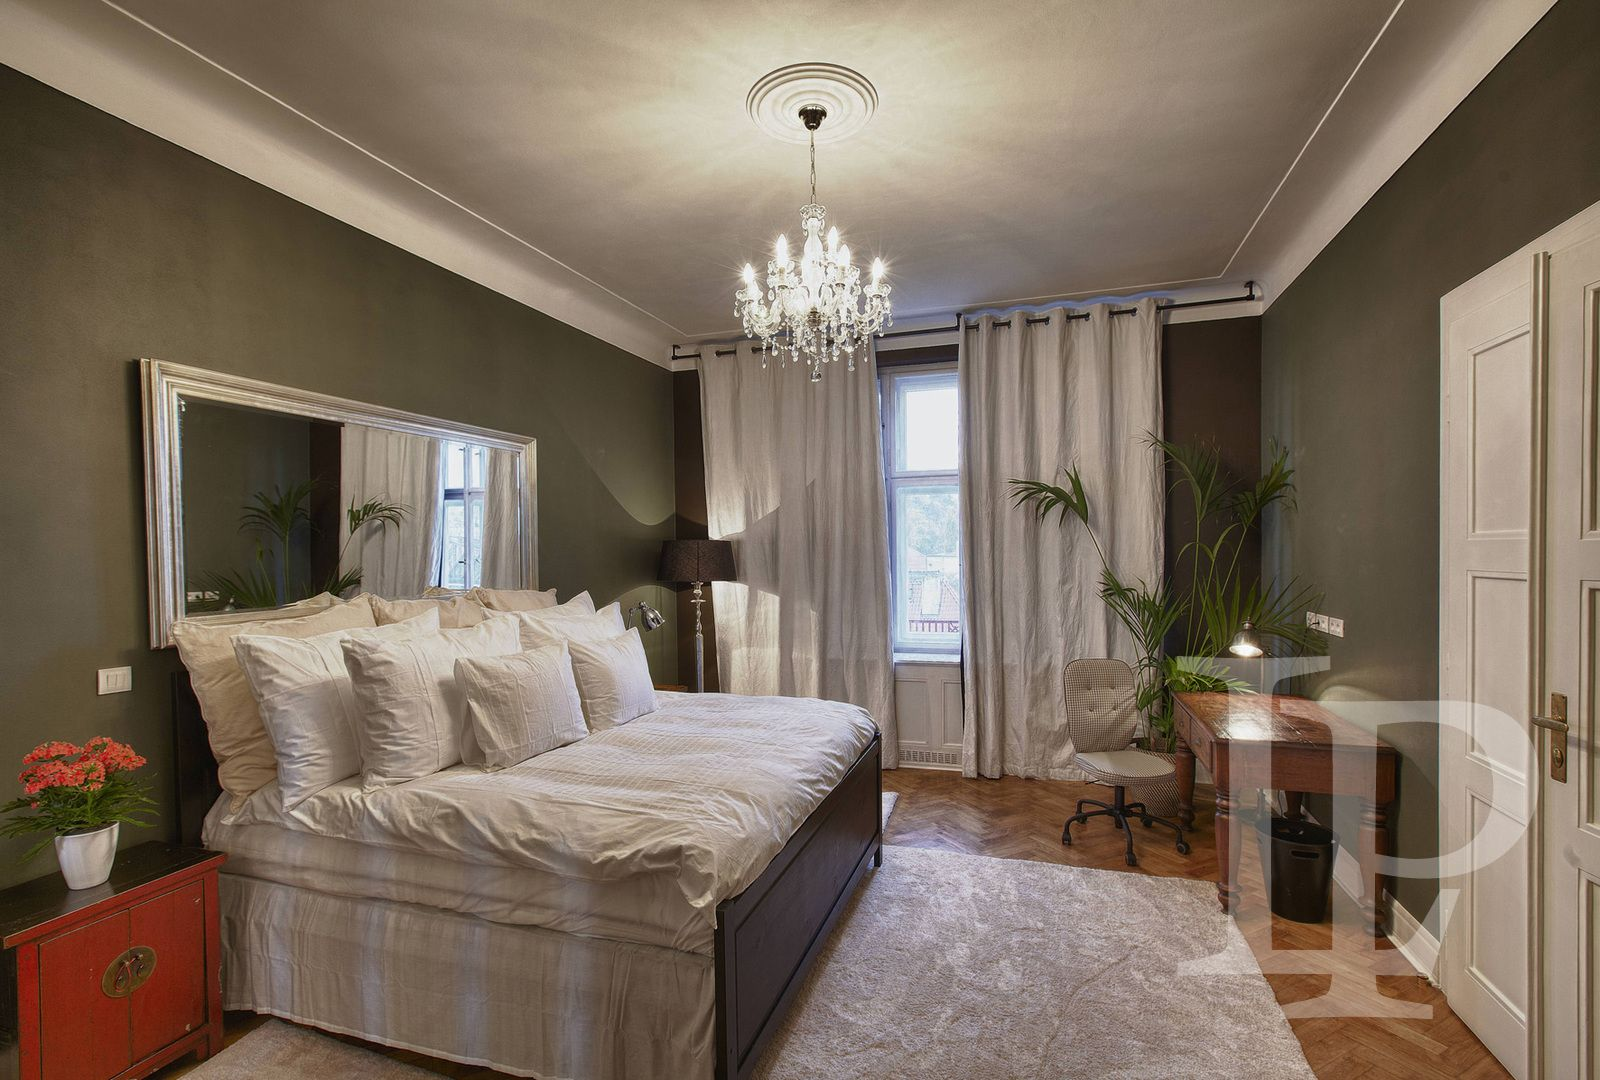 Luxusní apartmán s výhledem na Prahu, Praha 2